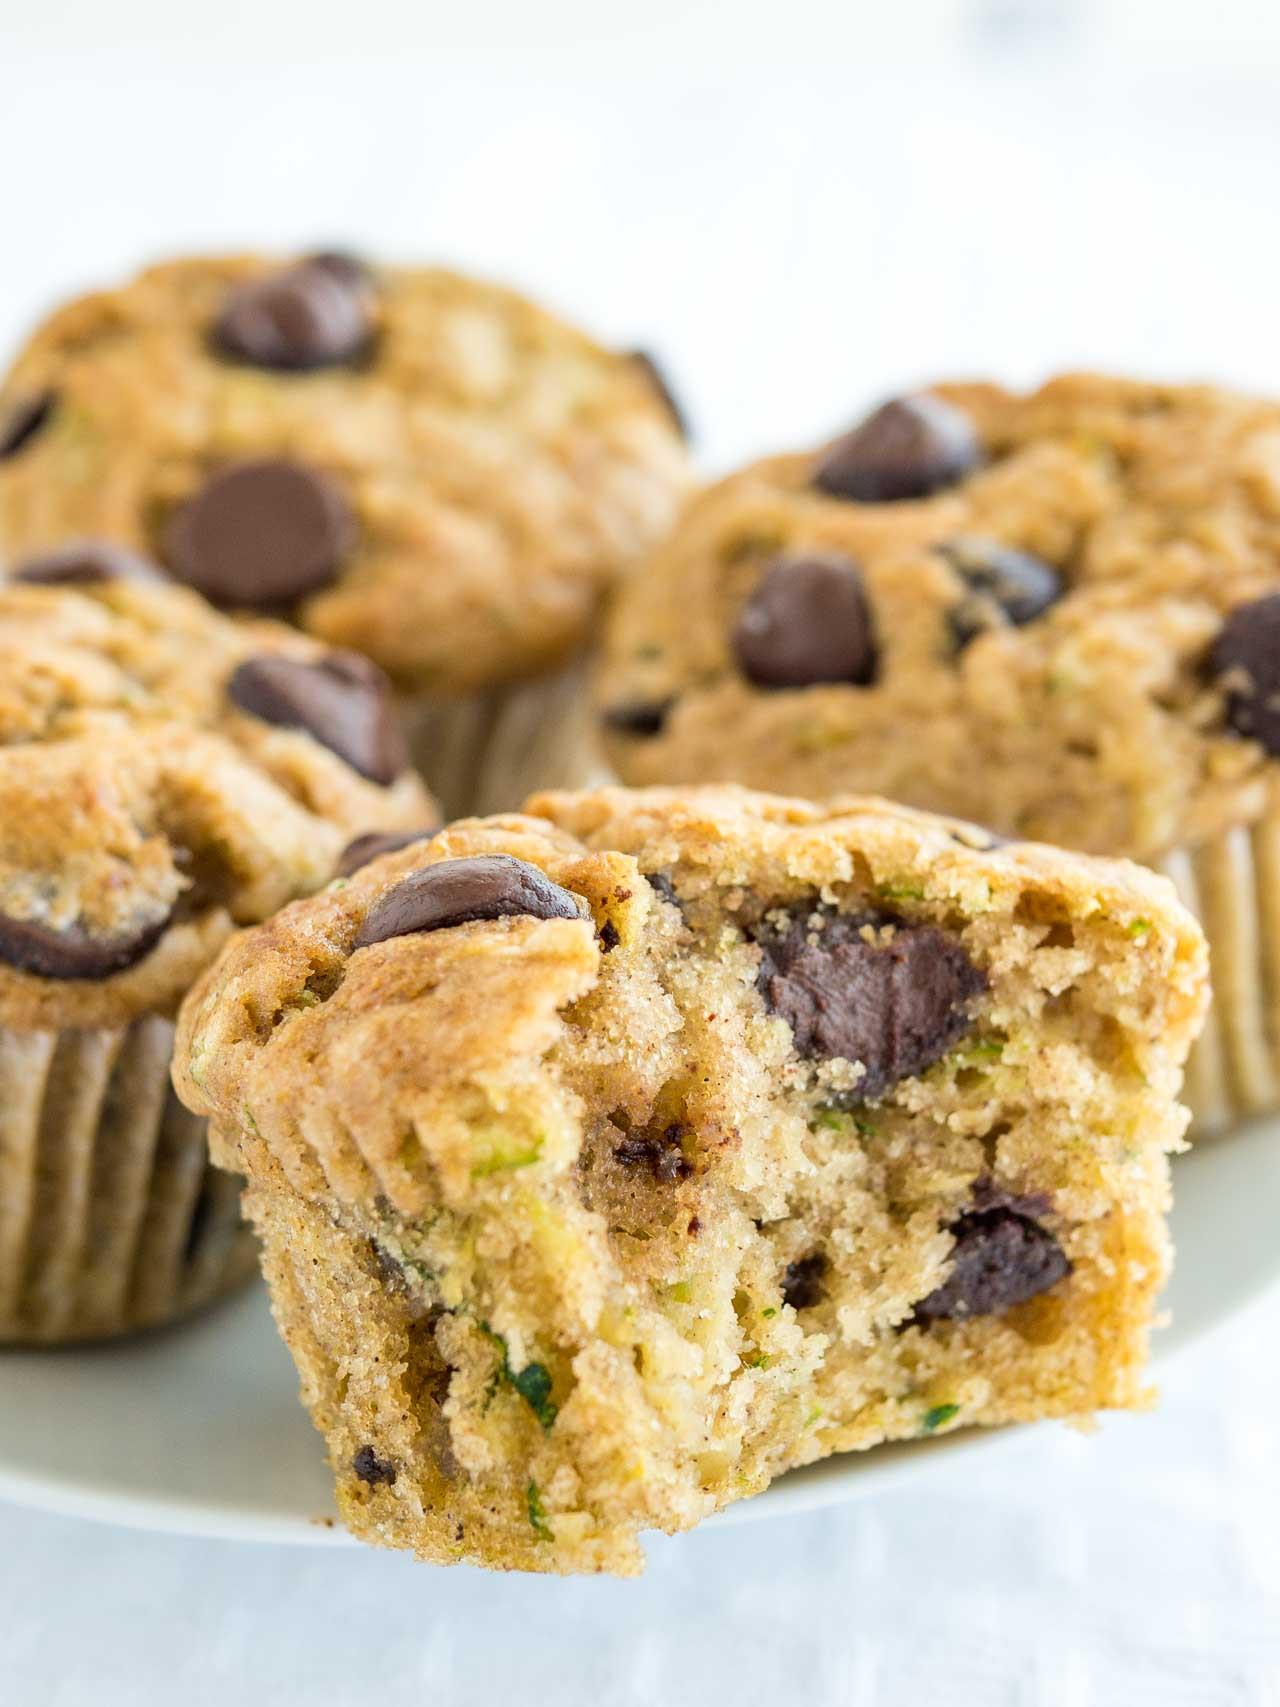 Healthy Zucchini Chocolate Chip Muffins  Zucchini Chocolate Chip Muffins Recipe Tips to make